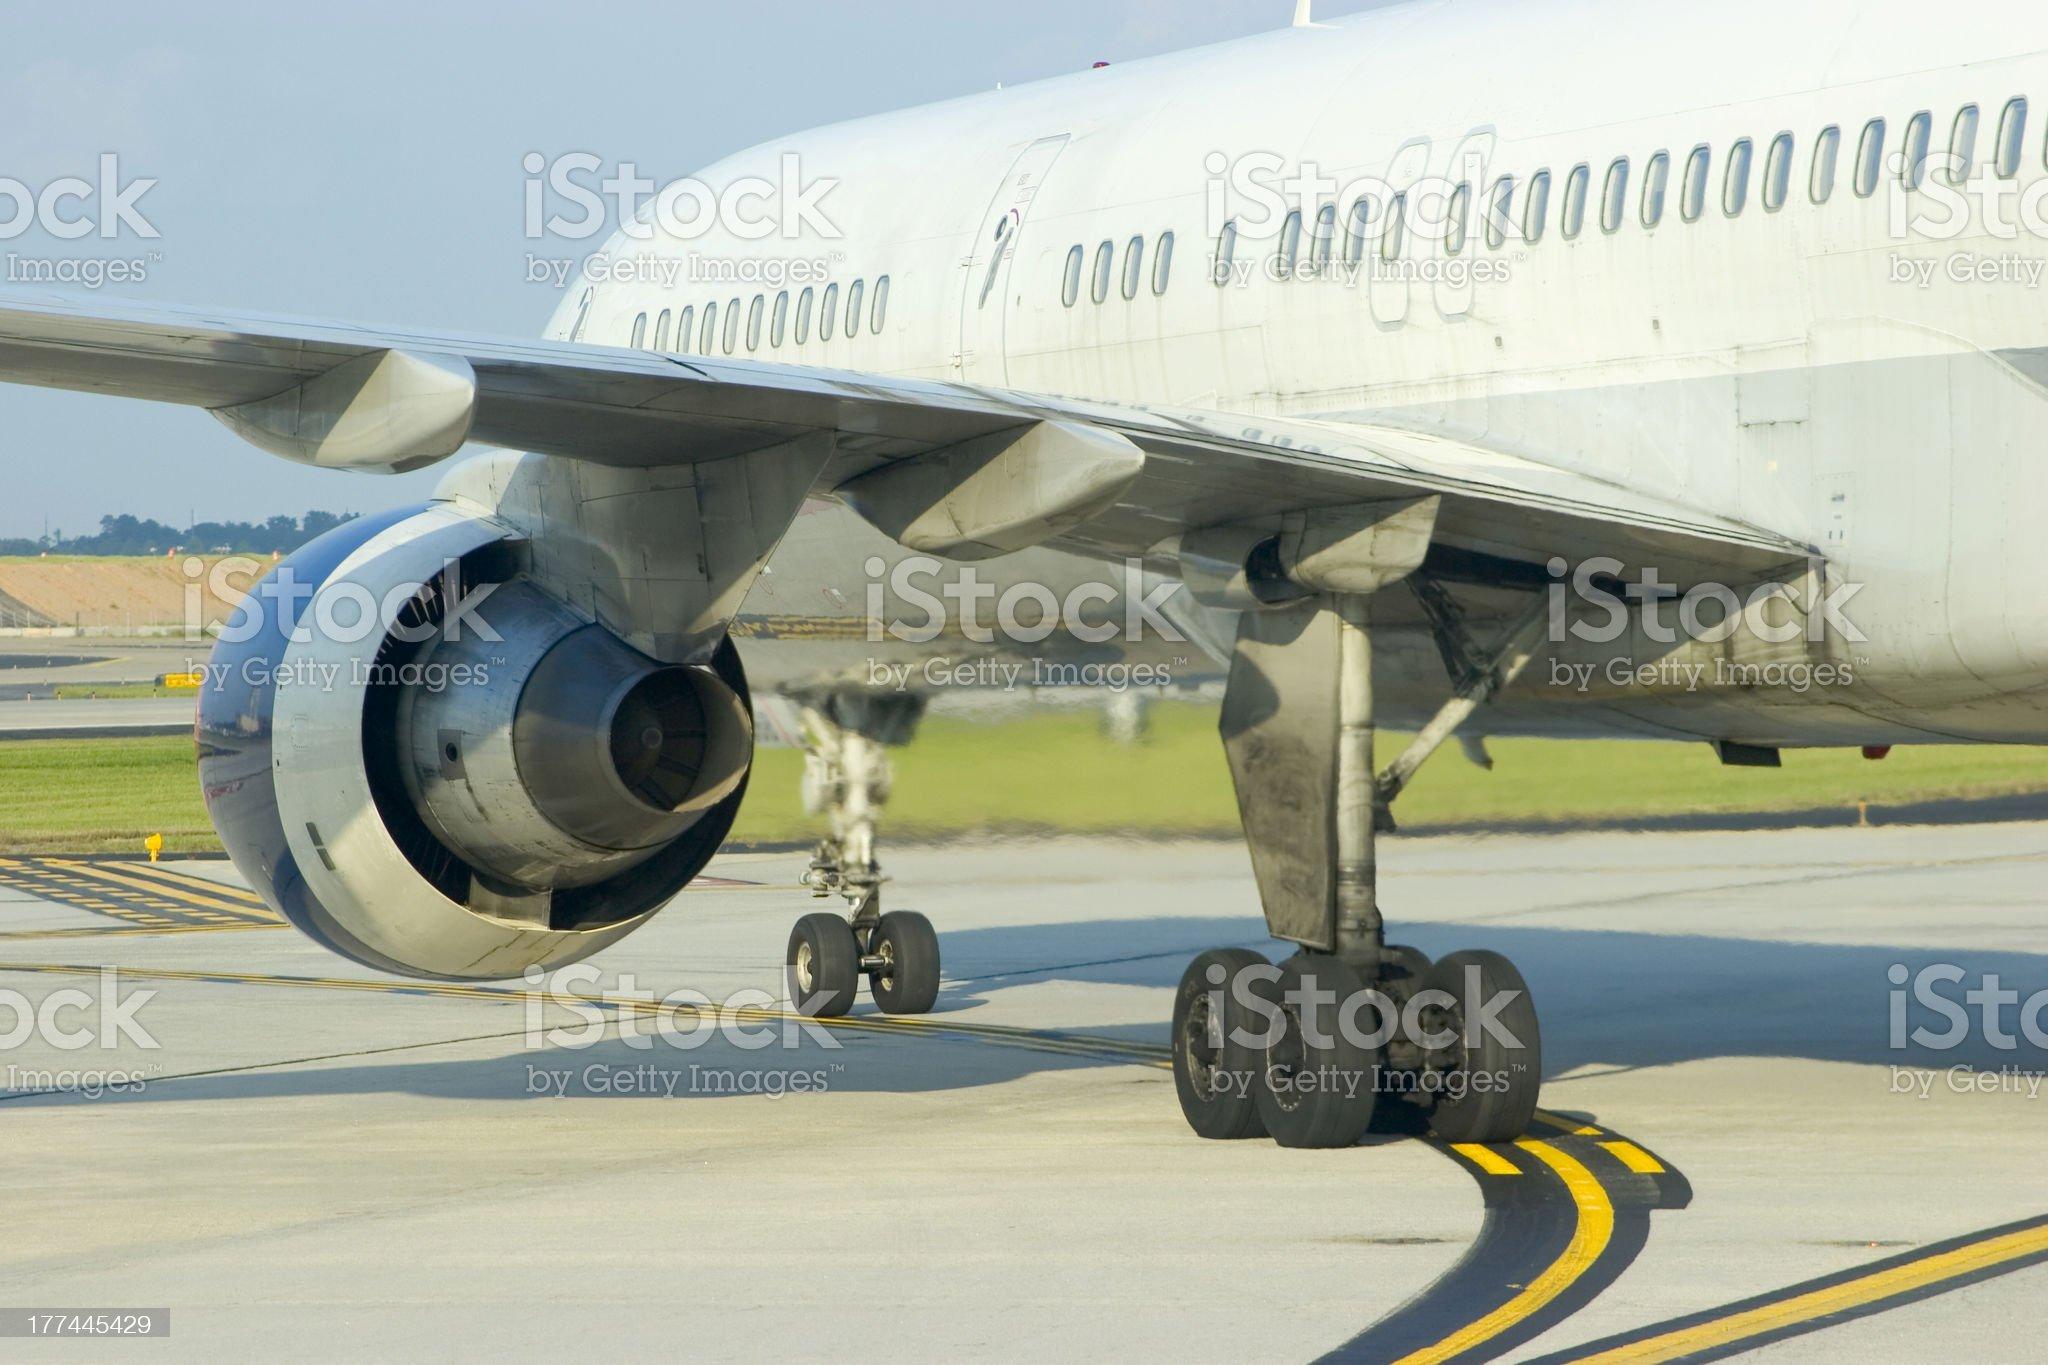 Airplane Engine Rear royalty-free stock photo